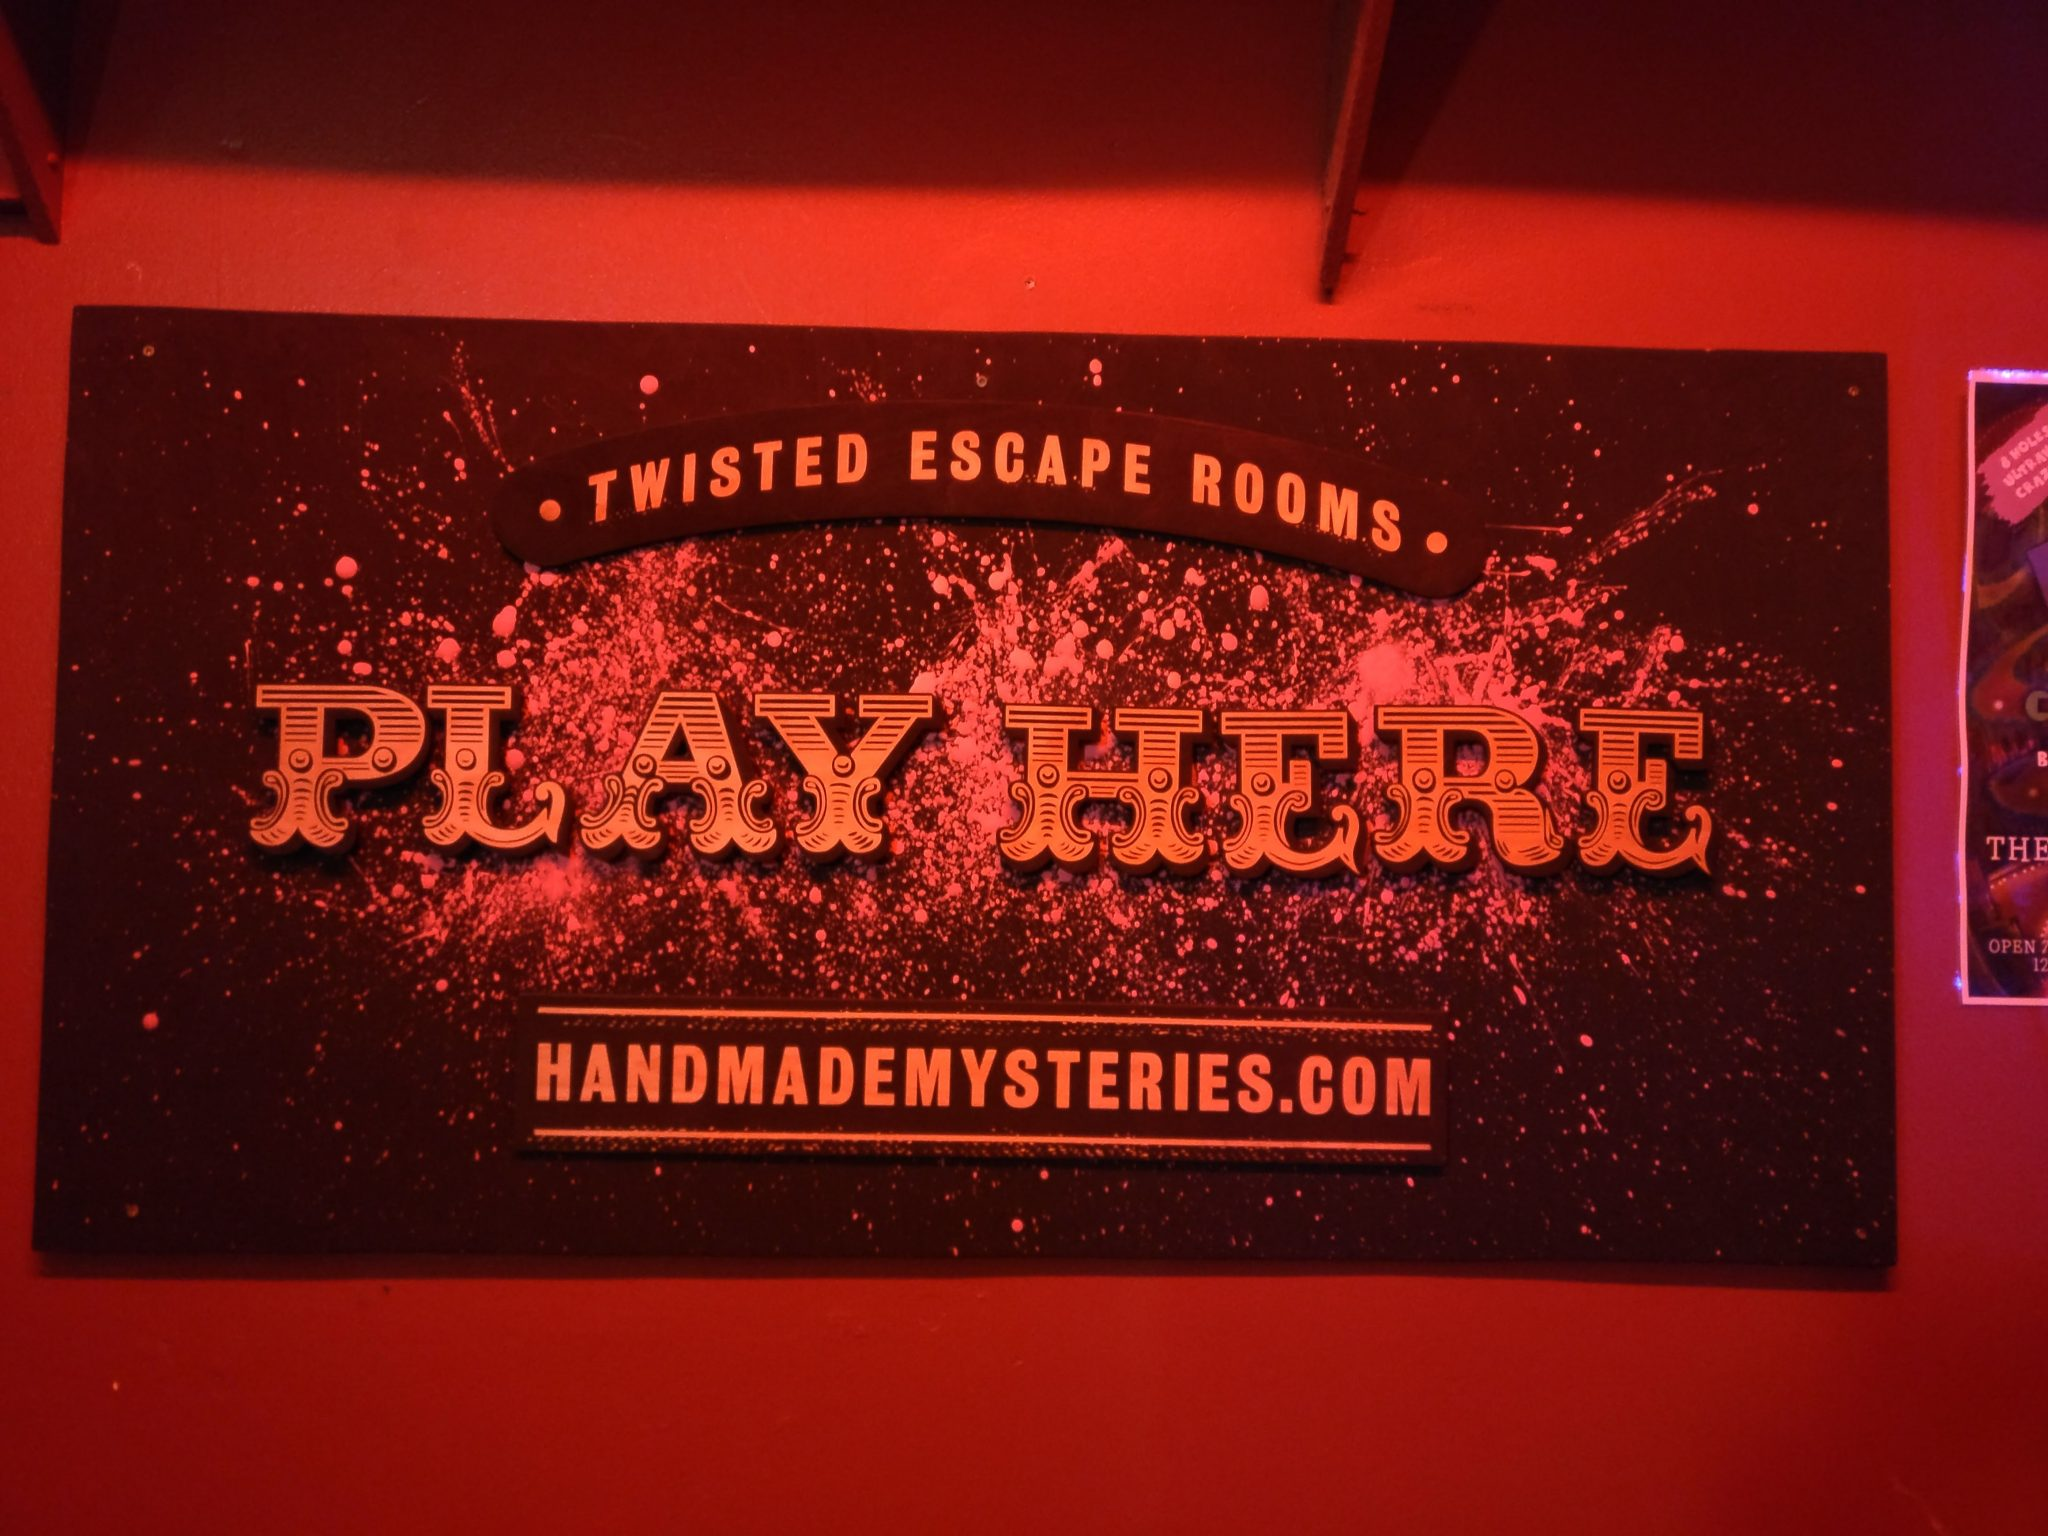 Handmade Mysteries sign